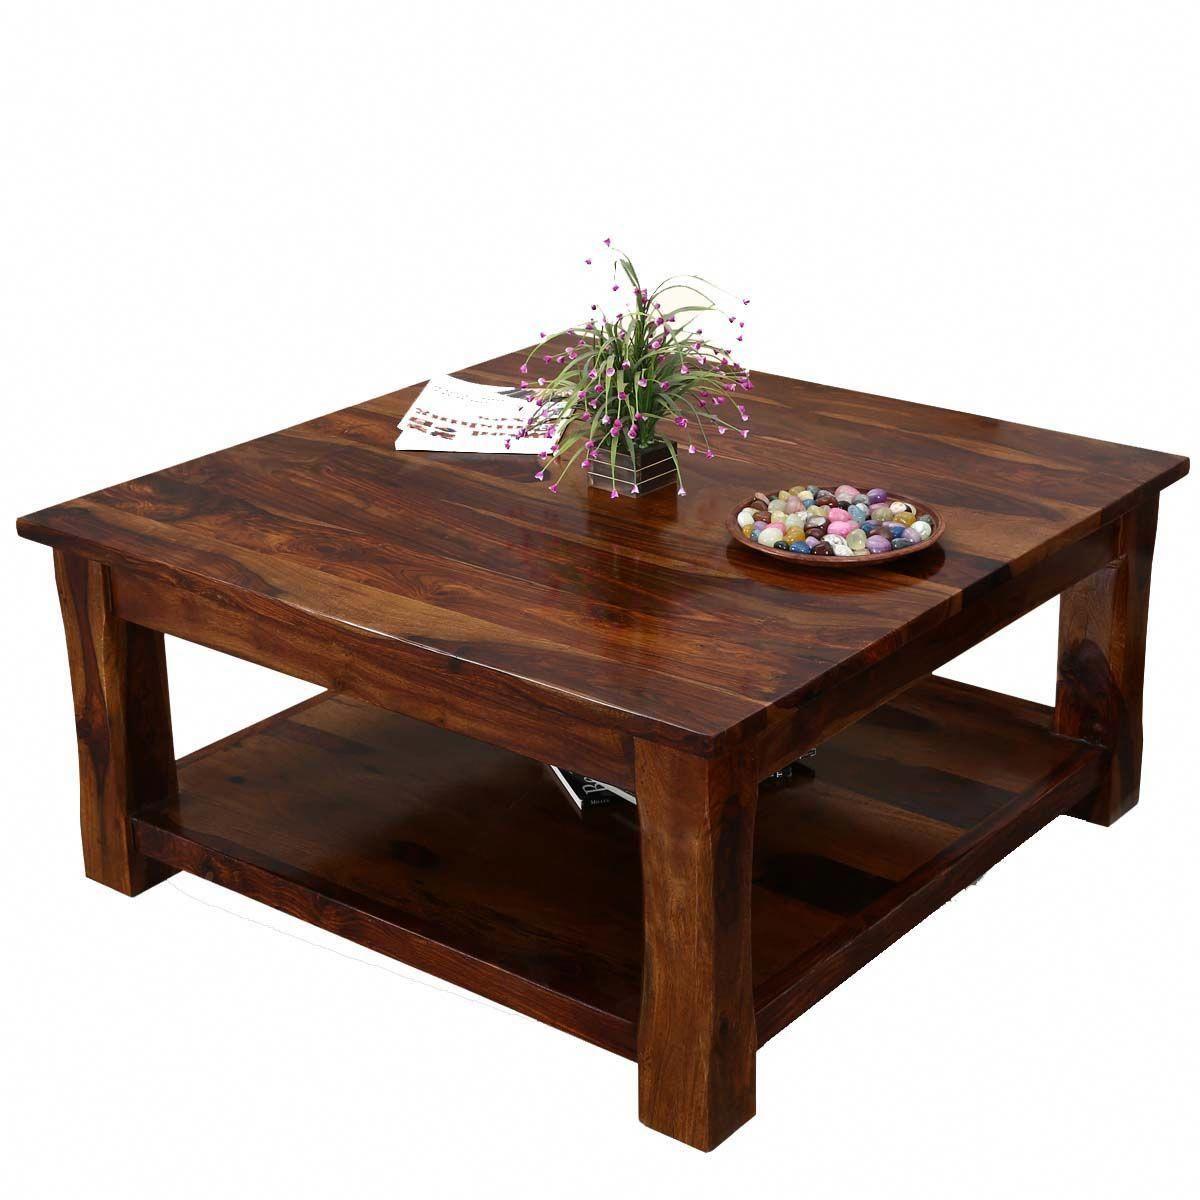 Rustic Solid Wood Sierra Nevada 2 Tier Square Shaker Coffee Table Buildwoodtable Rustic Square Coffee Table Coffee Table Coffee Table Square [ 1200 x 1200 Pixel ]